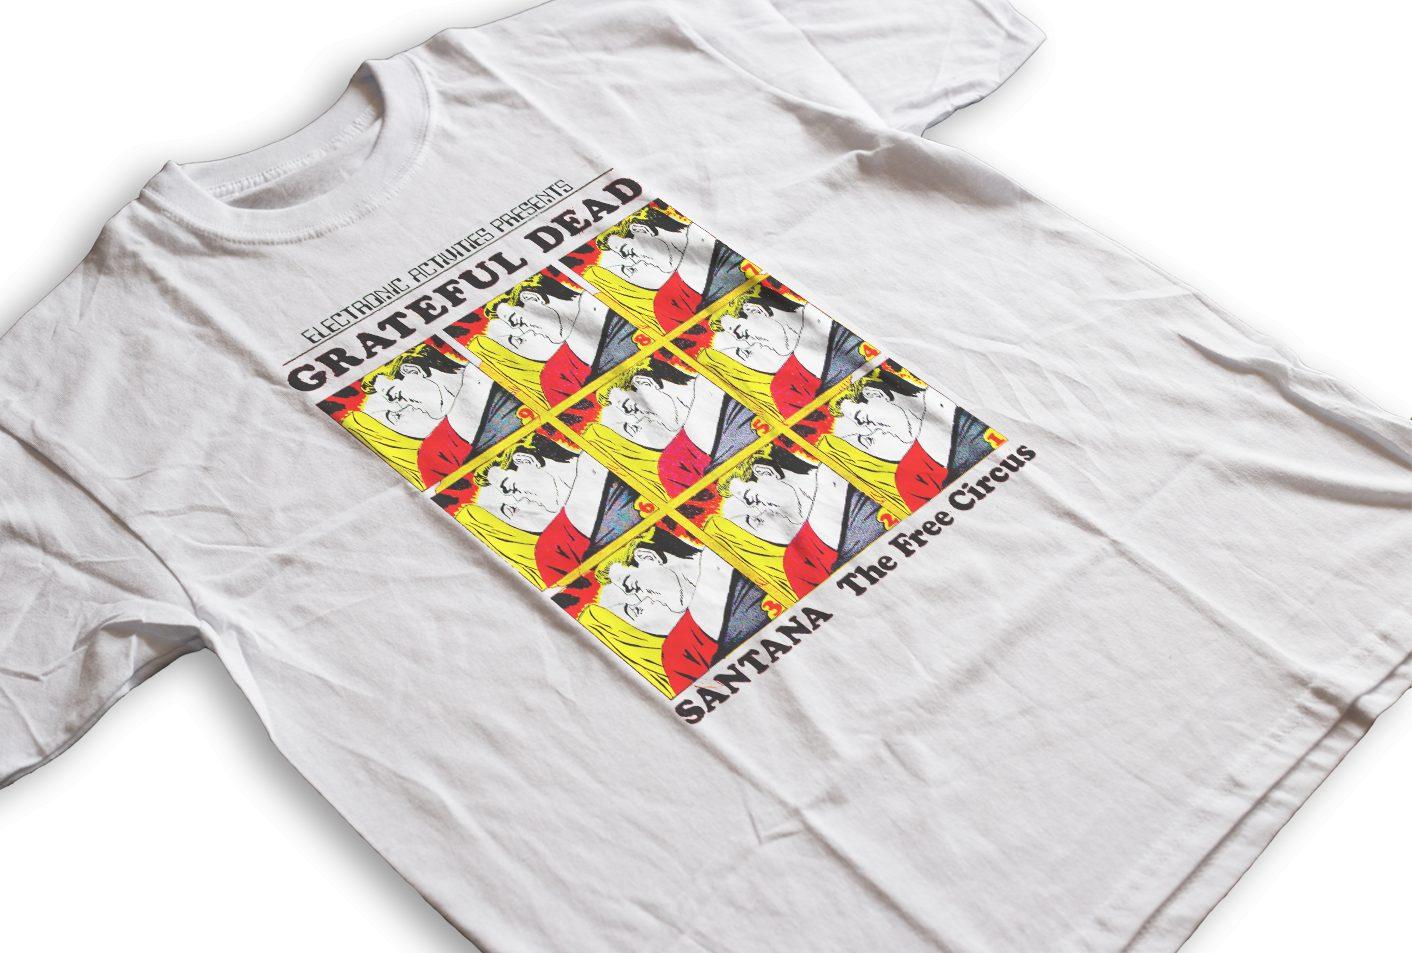 John Mayer | Grateful Dead Santana & The Free Circus | T-shirt